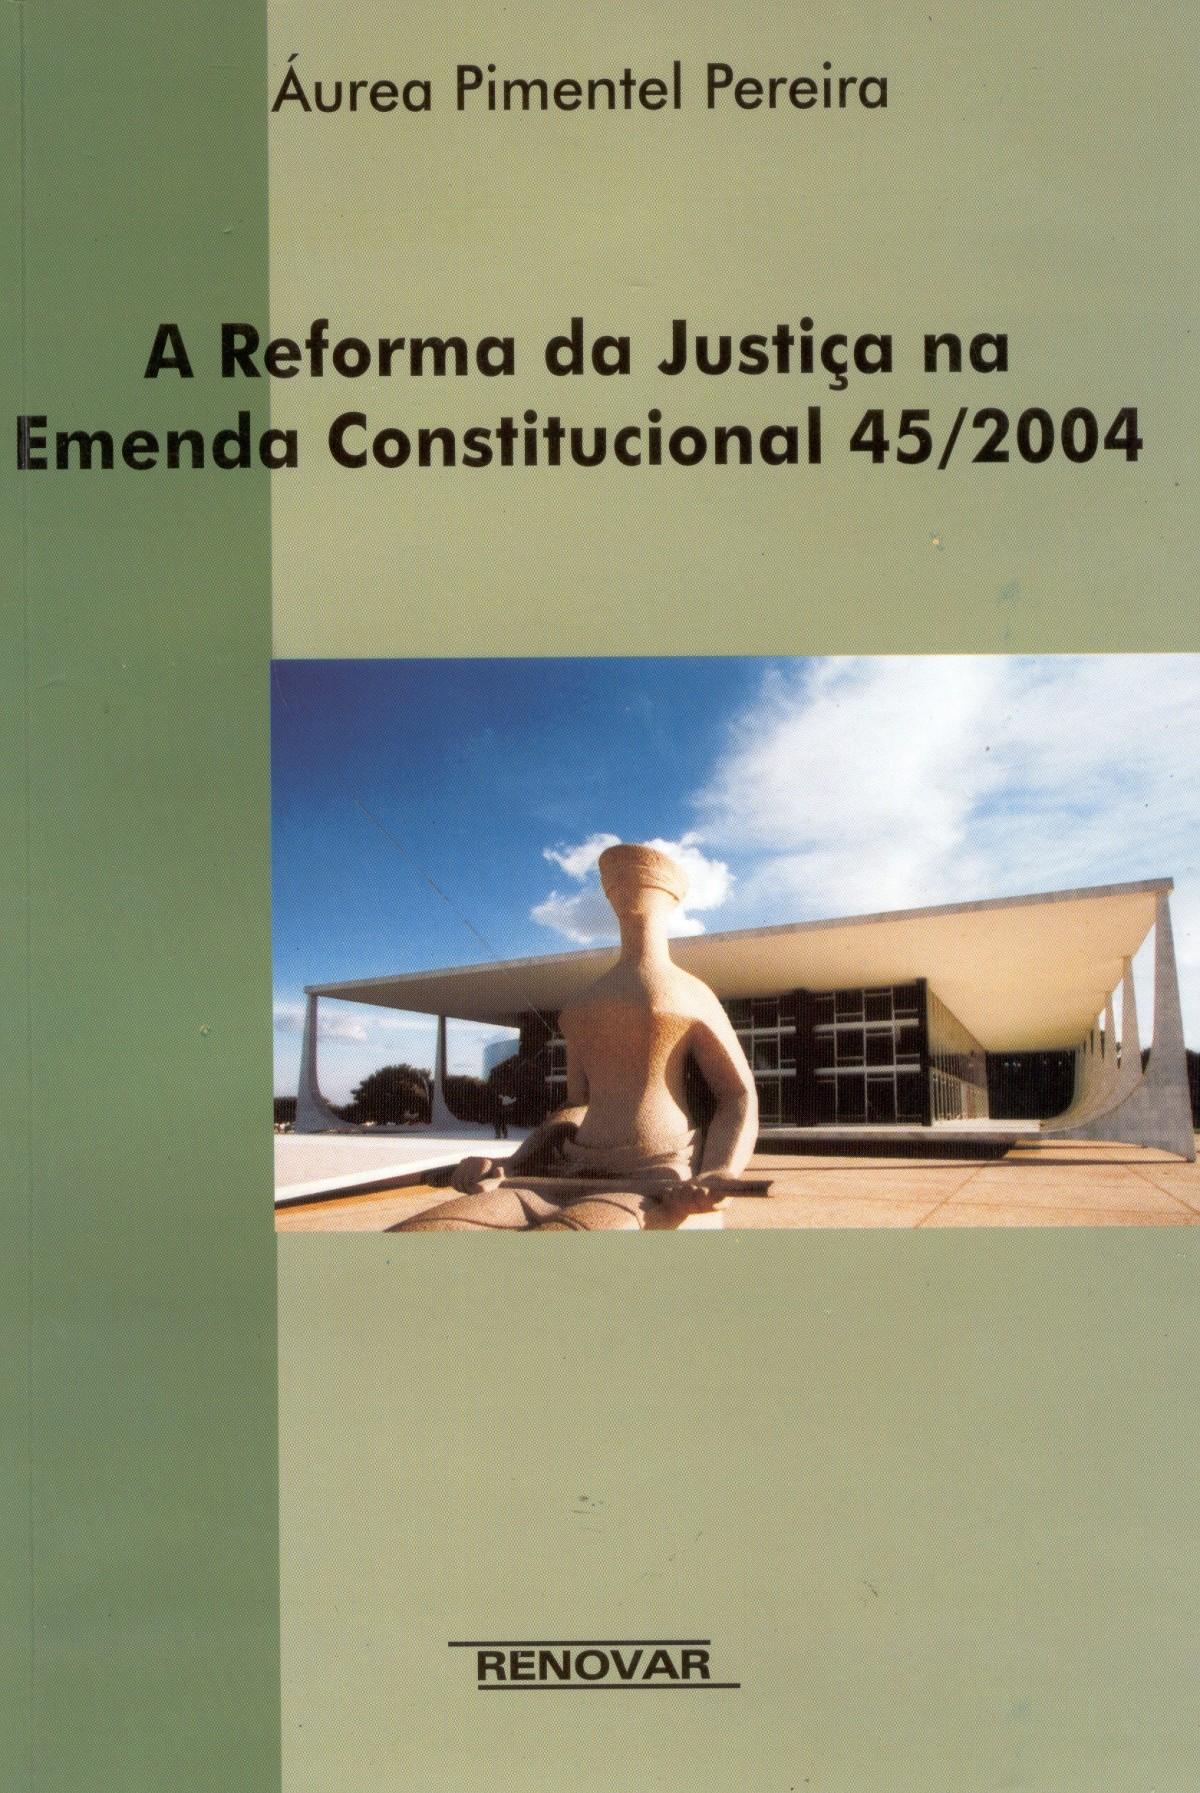 Foto 1 - A Reforma da Justiça na Emenda Constitucional 45/2004